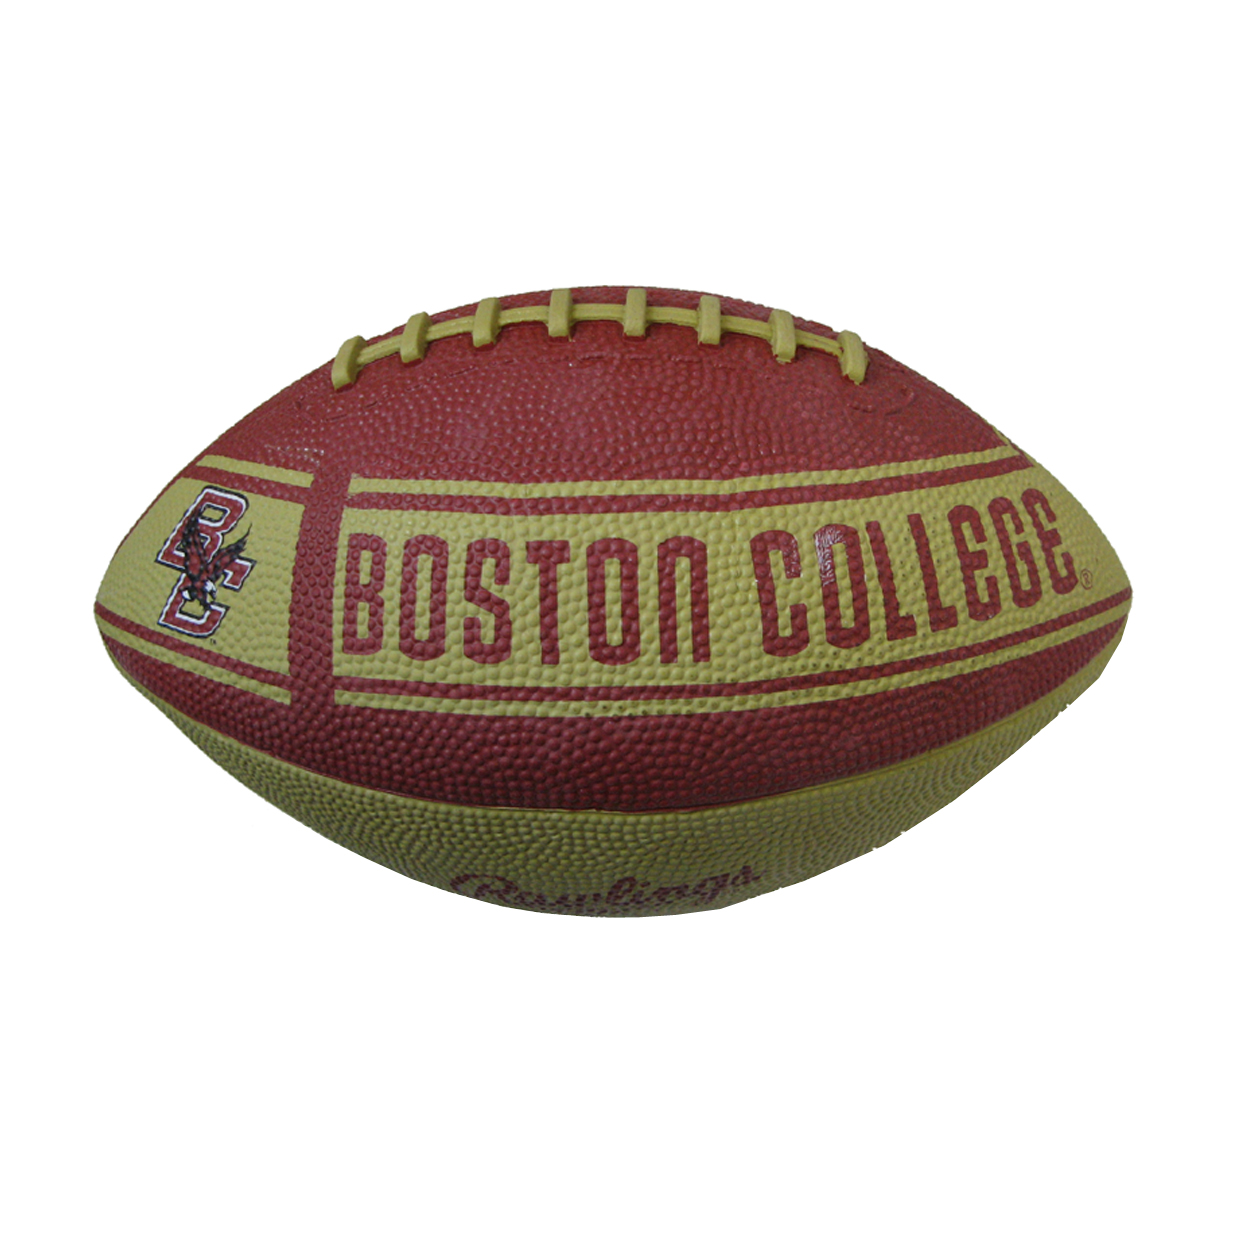 Hail Mary Football Boston College